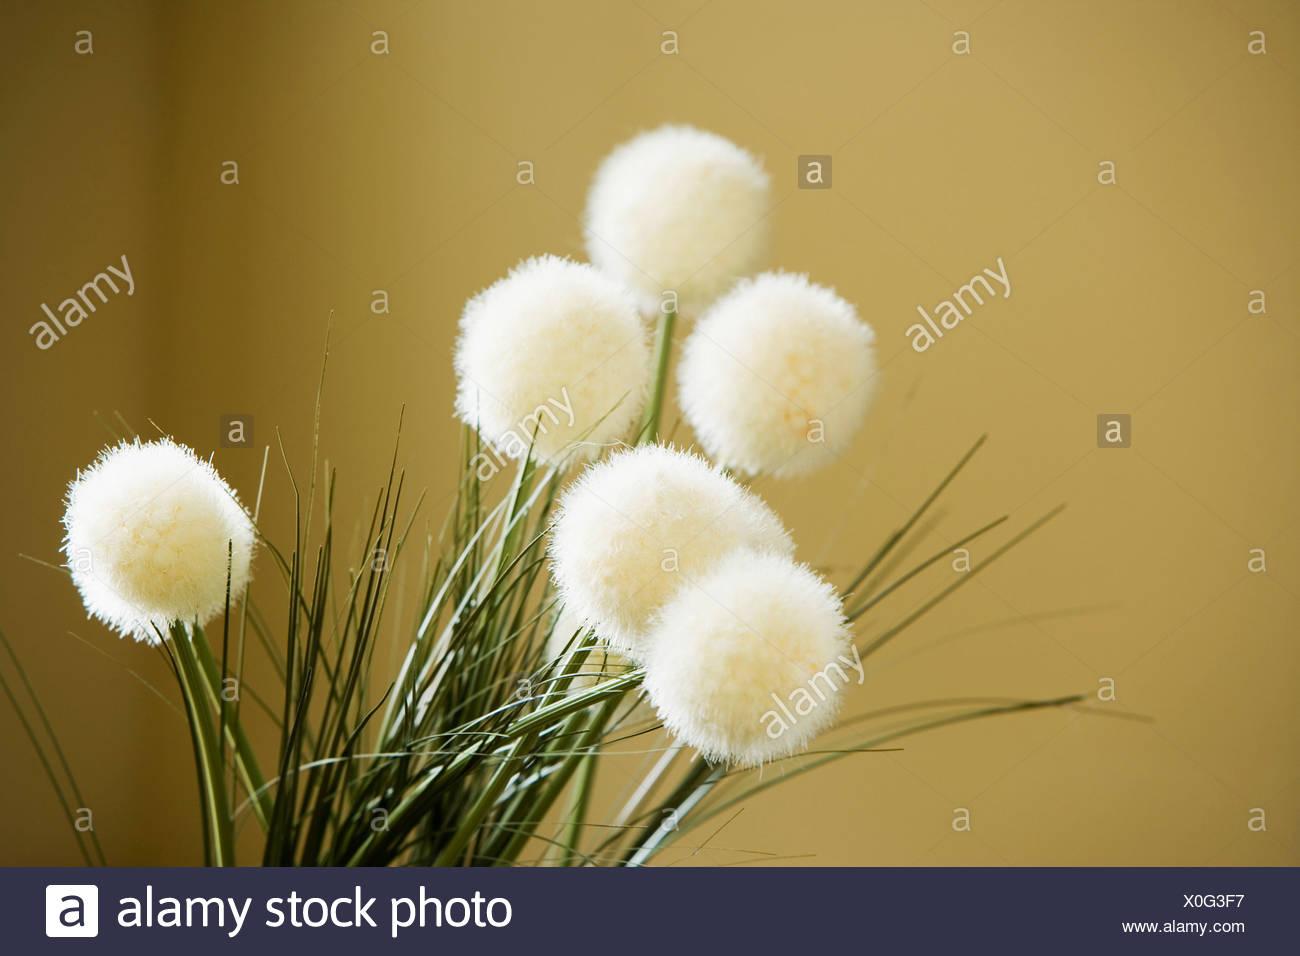 Puffy white flowers stock photo 275719899 alamy puffy white flowers mightylinksfo